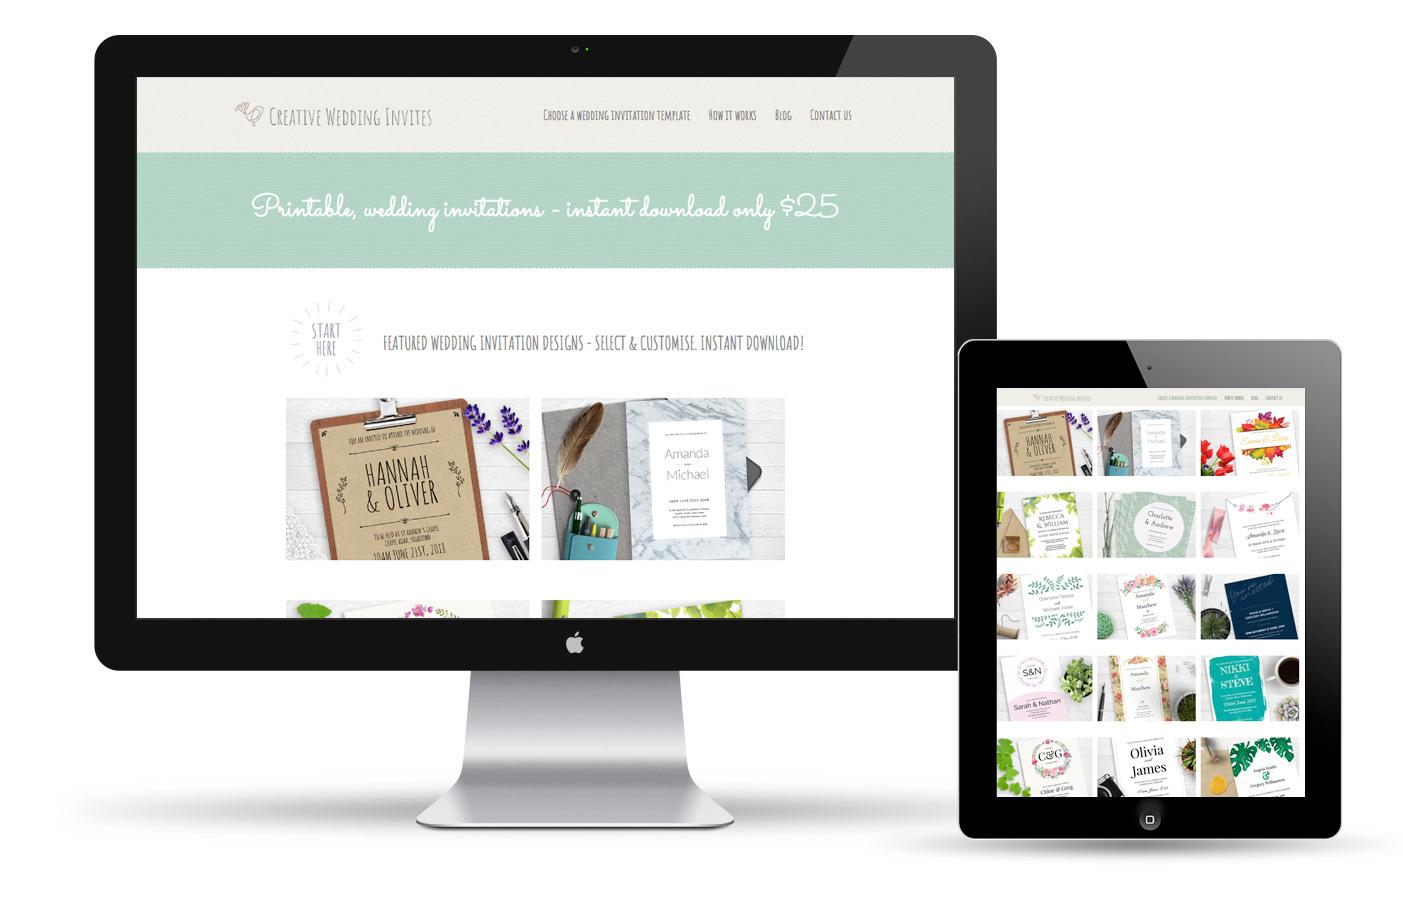 lee hanson creative wedding invites com wedding invitation builder